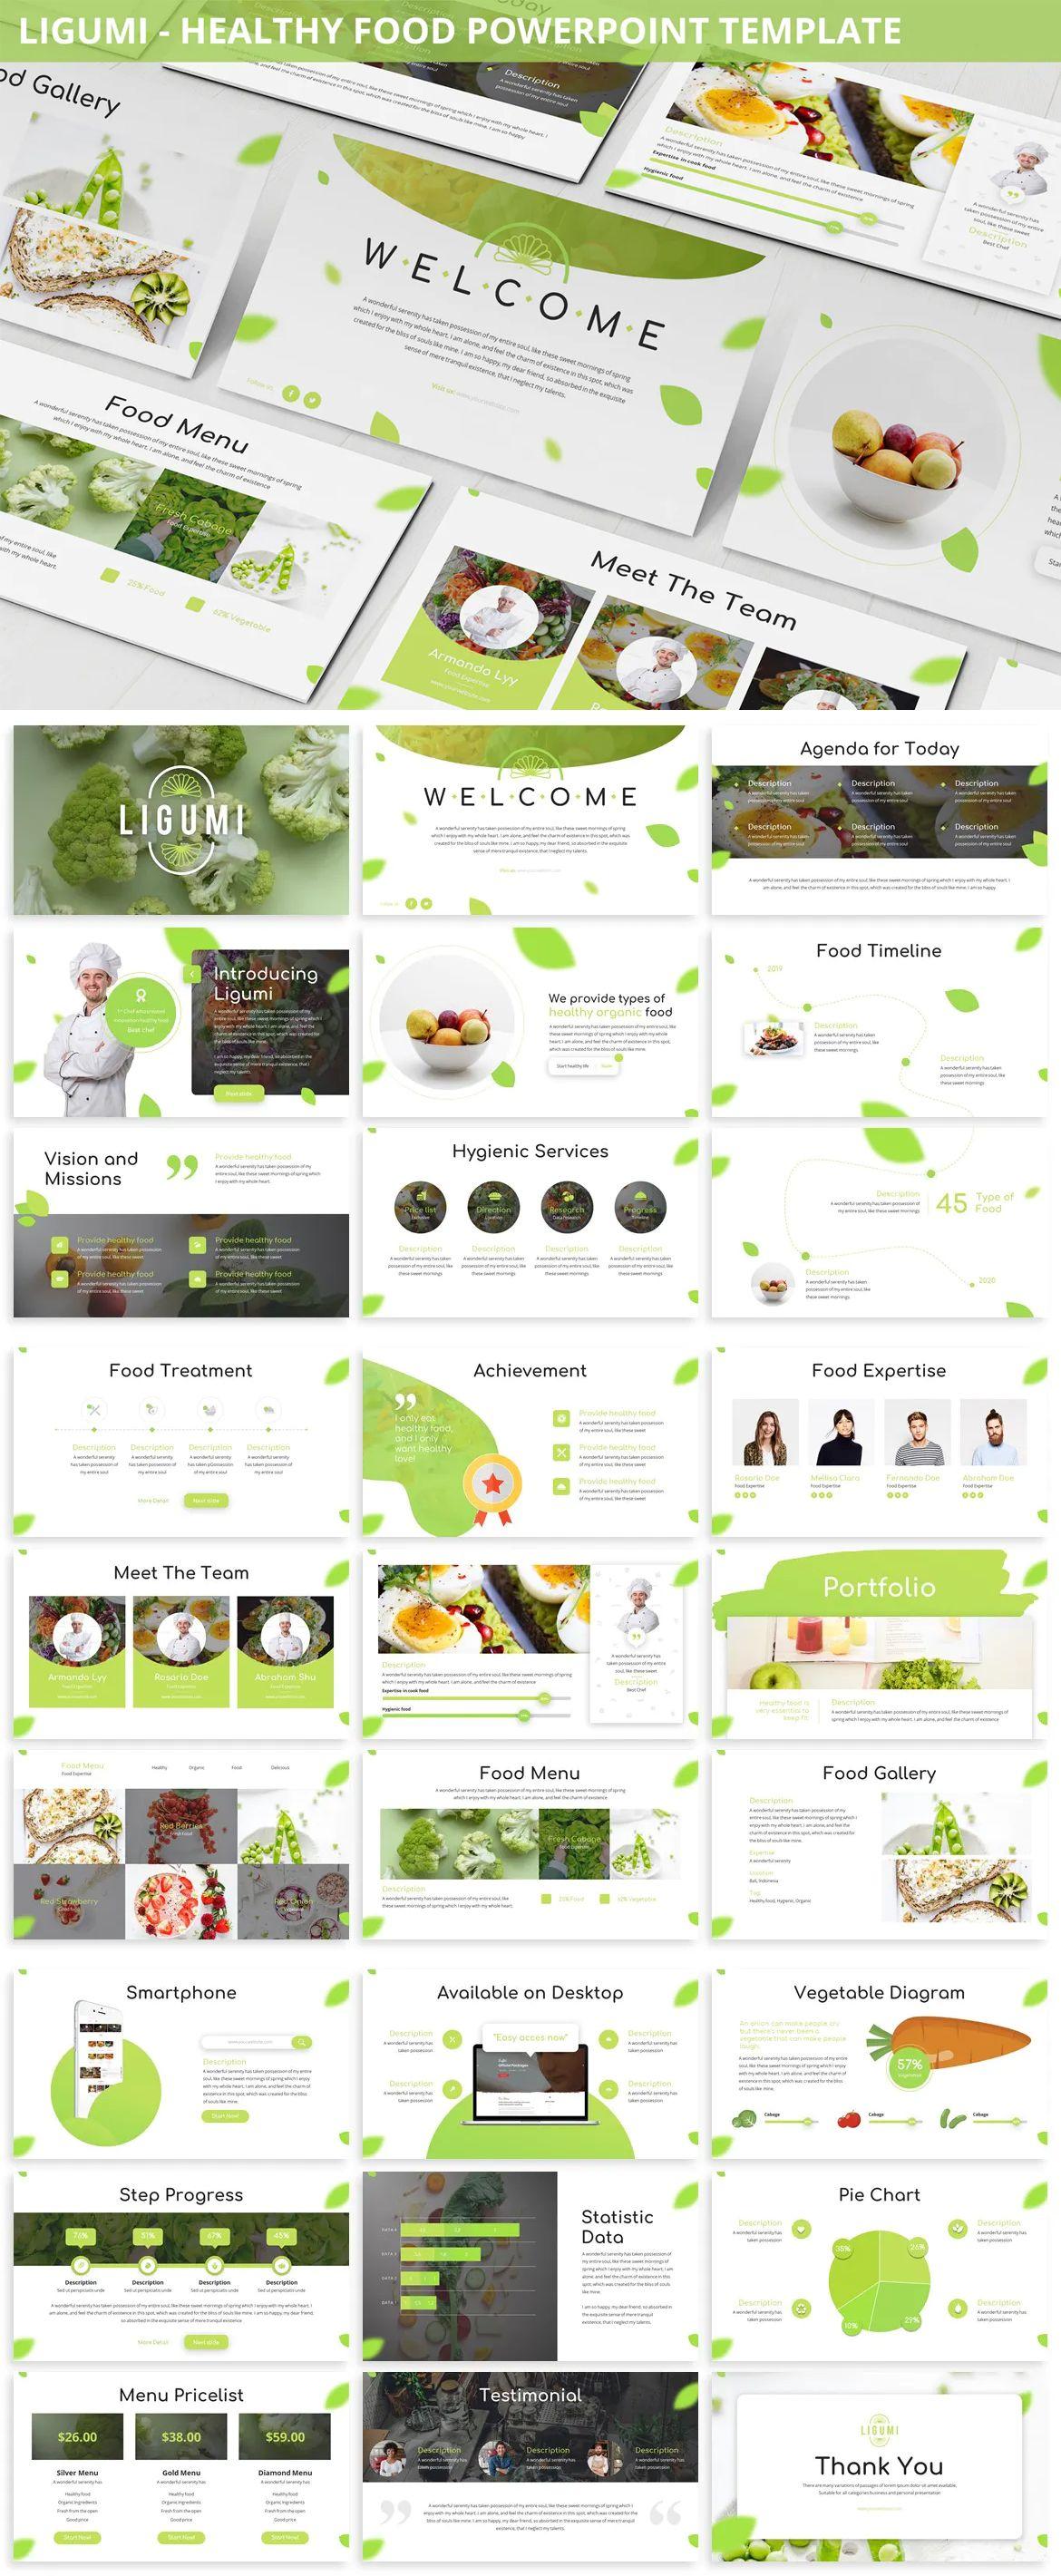 Ligumi Healthy Food Powerpoint Presentation Template 12 Files